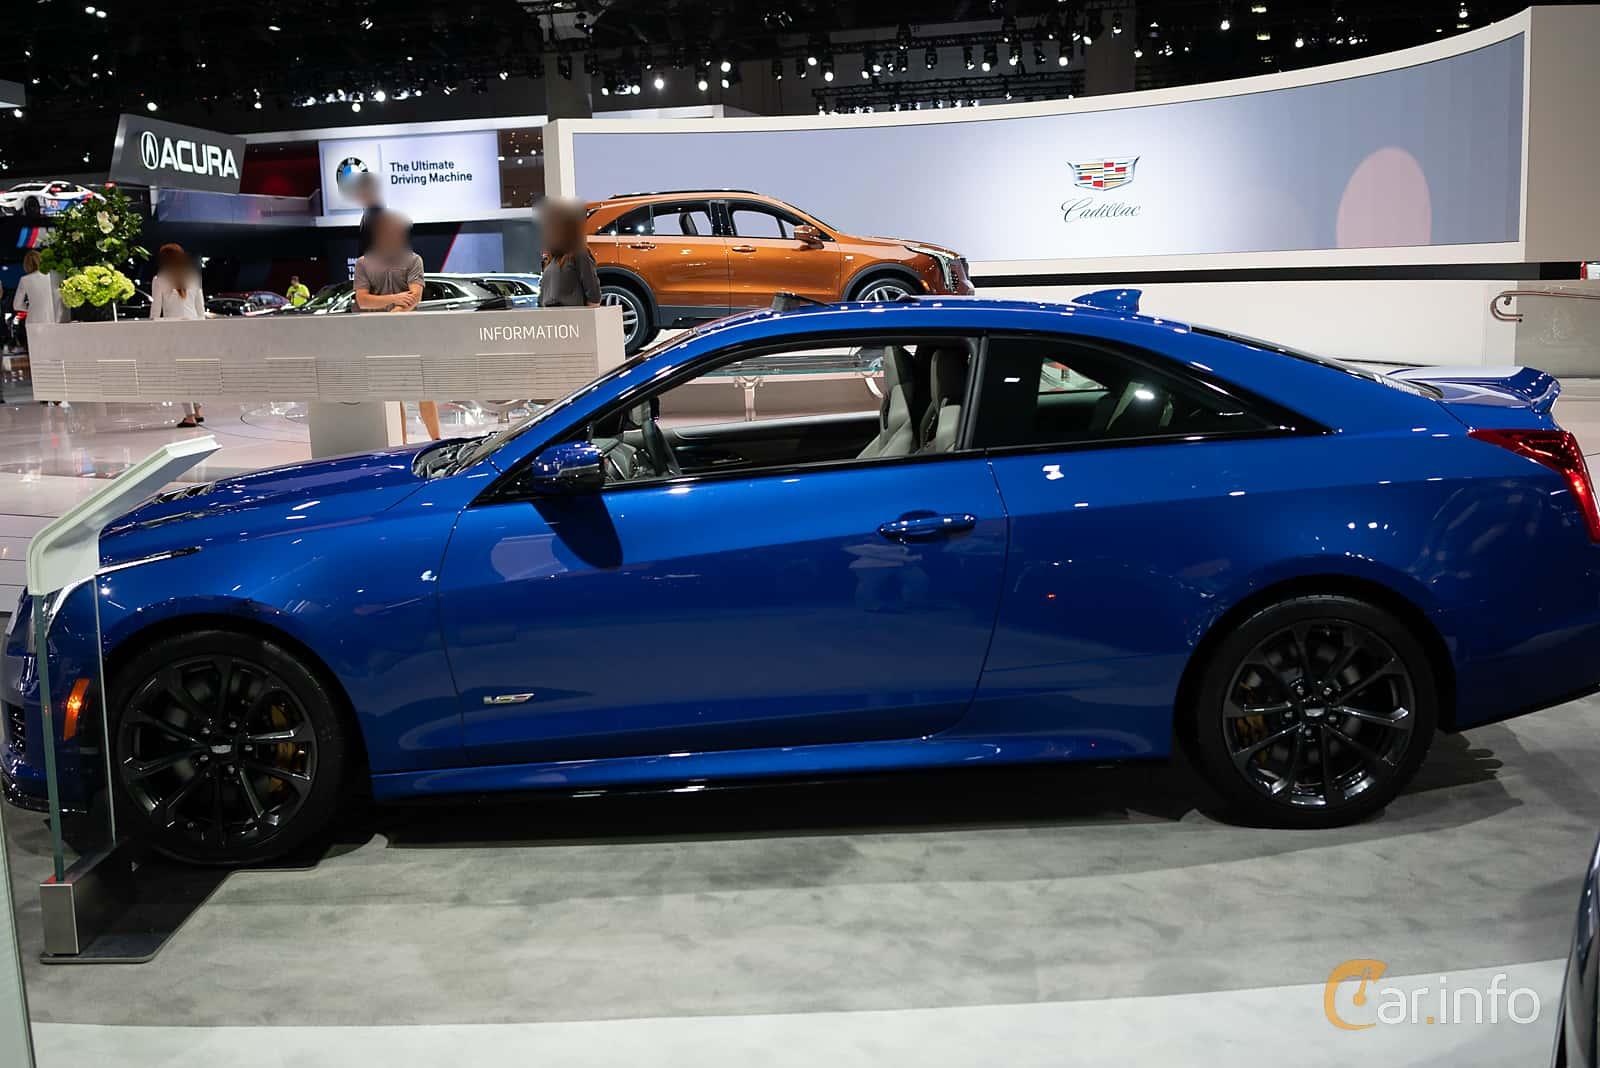 Cadillac ATS-V Coupé 3.6 V6 470hp, 2019 at LA Motor Show 2018